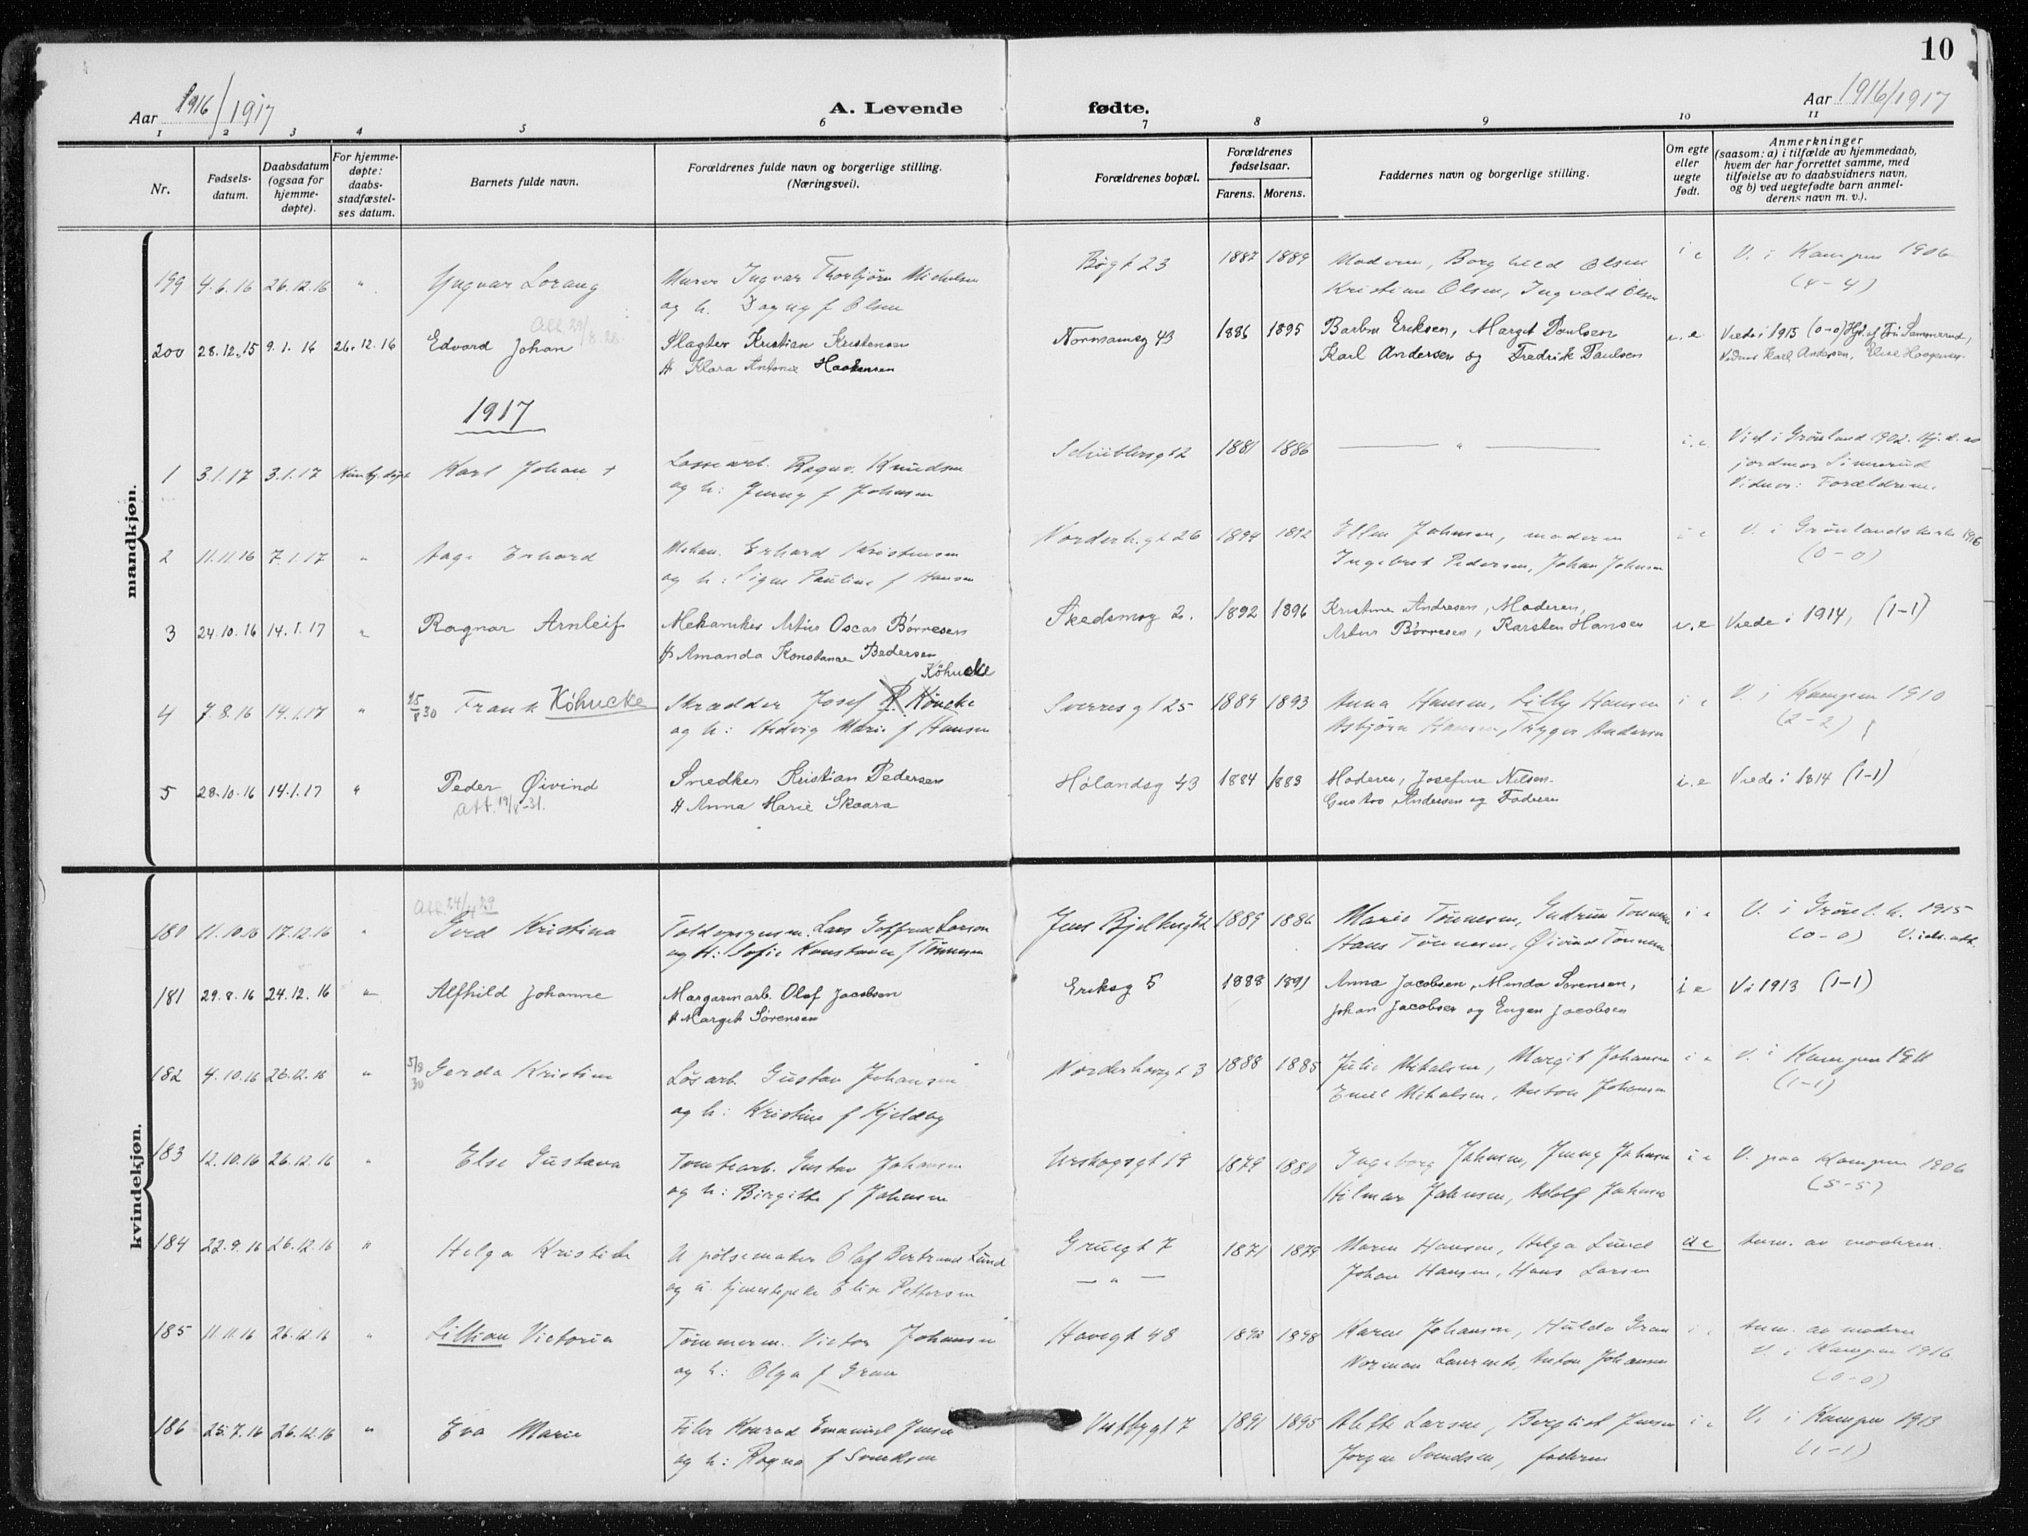 SAO, Kampen prestekontor Kirkebøker, F/Fa/L0012: Parish register (official) no. I 12, 1916-1921, p. 10